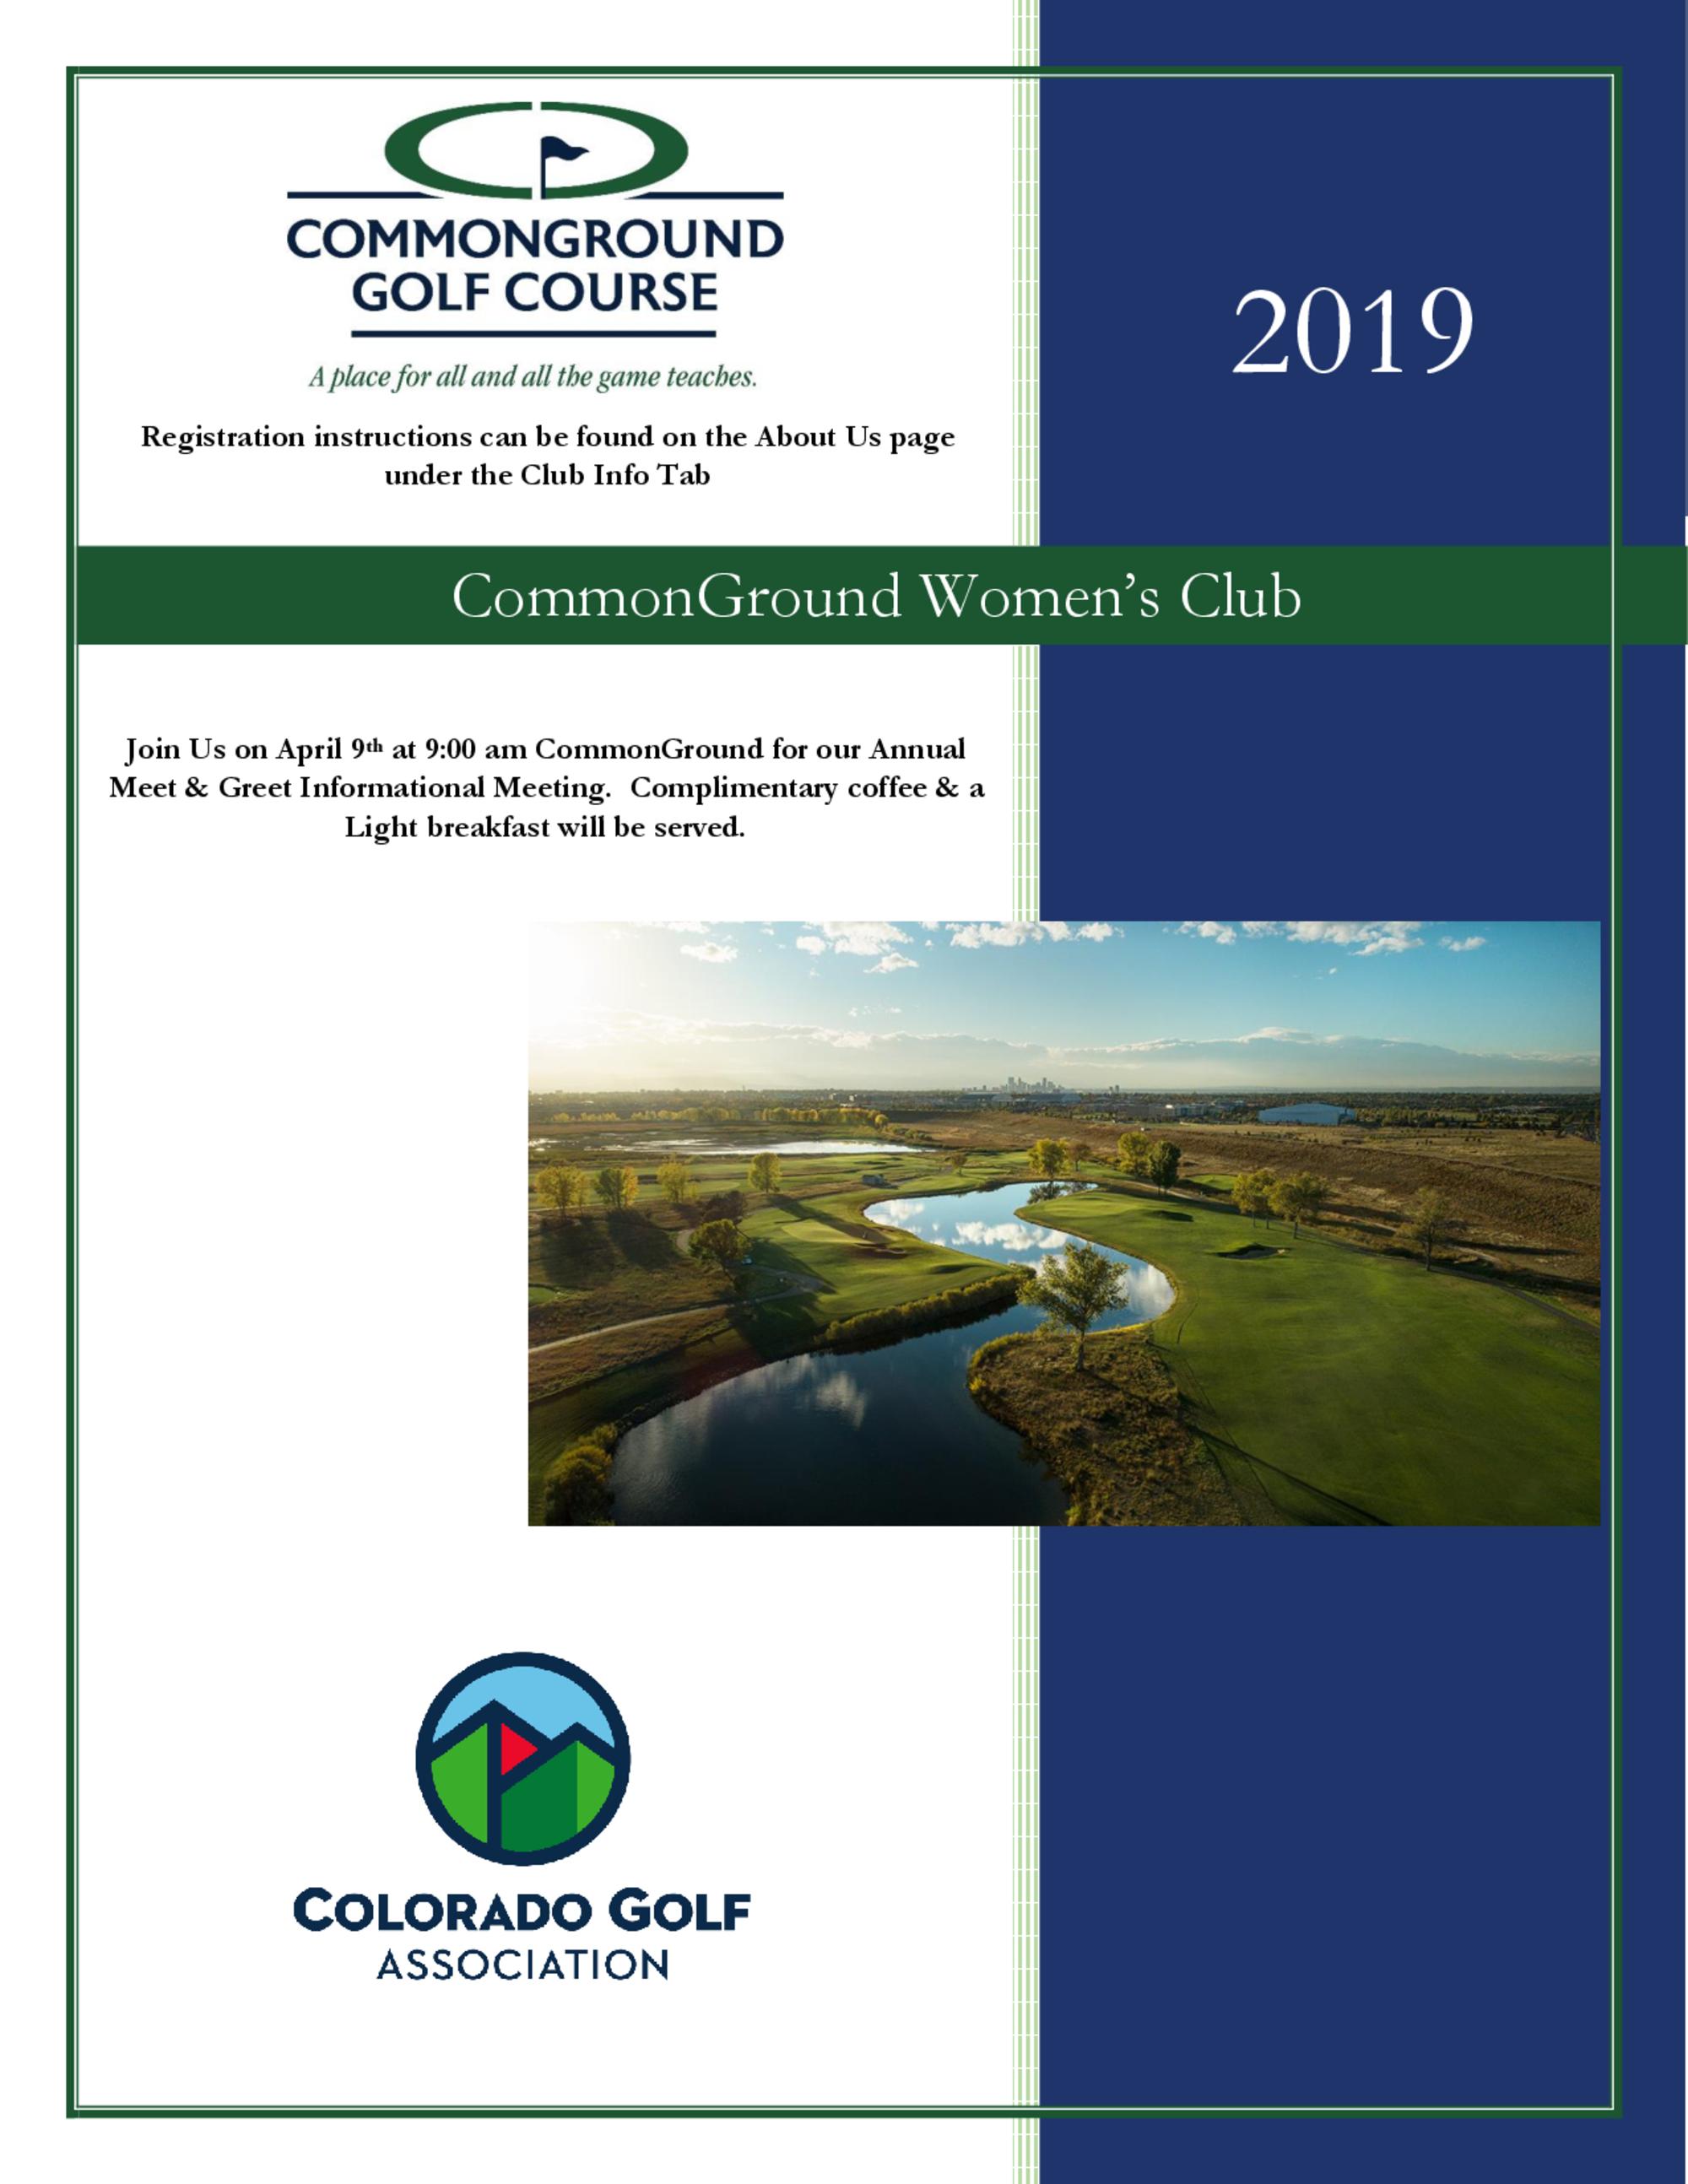 Wc tournament portal cover sheet 1